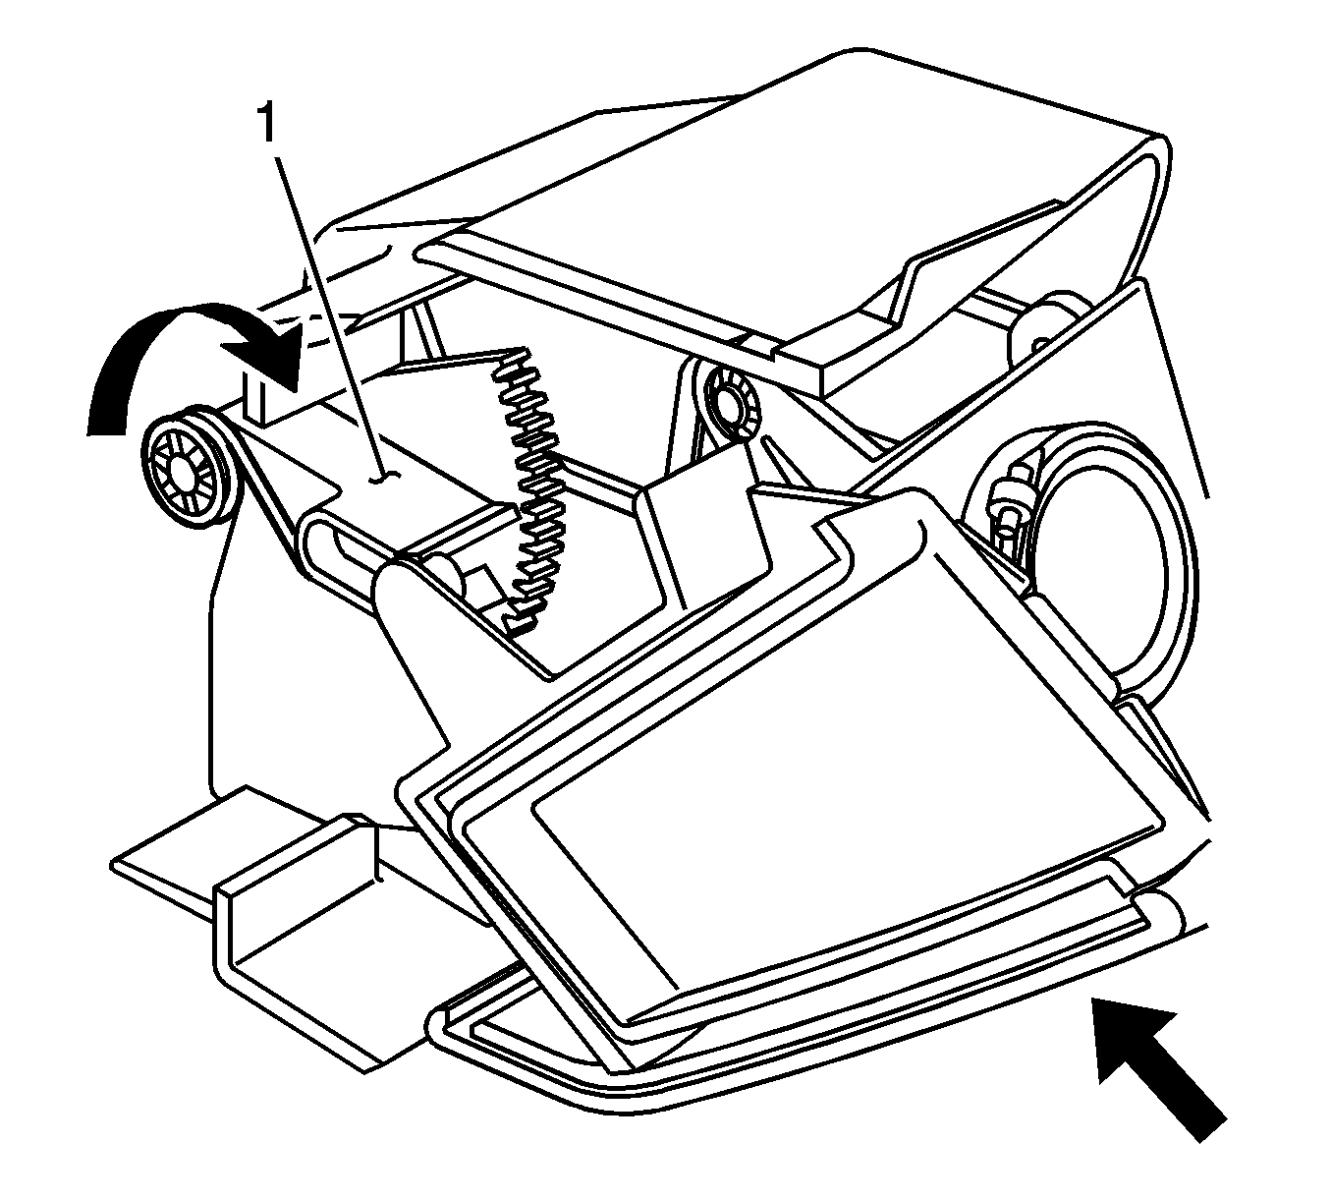 hight resolution of cadillac sts ashtray wiring diagram wiring library diagram h9 1967 cadillac alternator wiring diagram cadillac sts ashtray wiring diagram